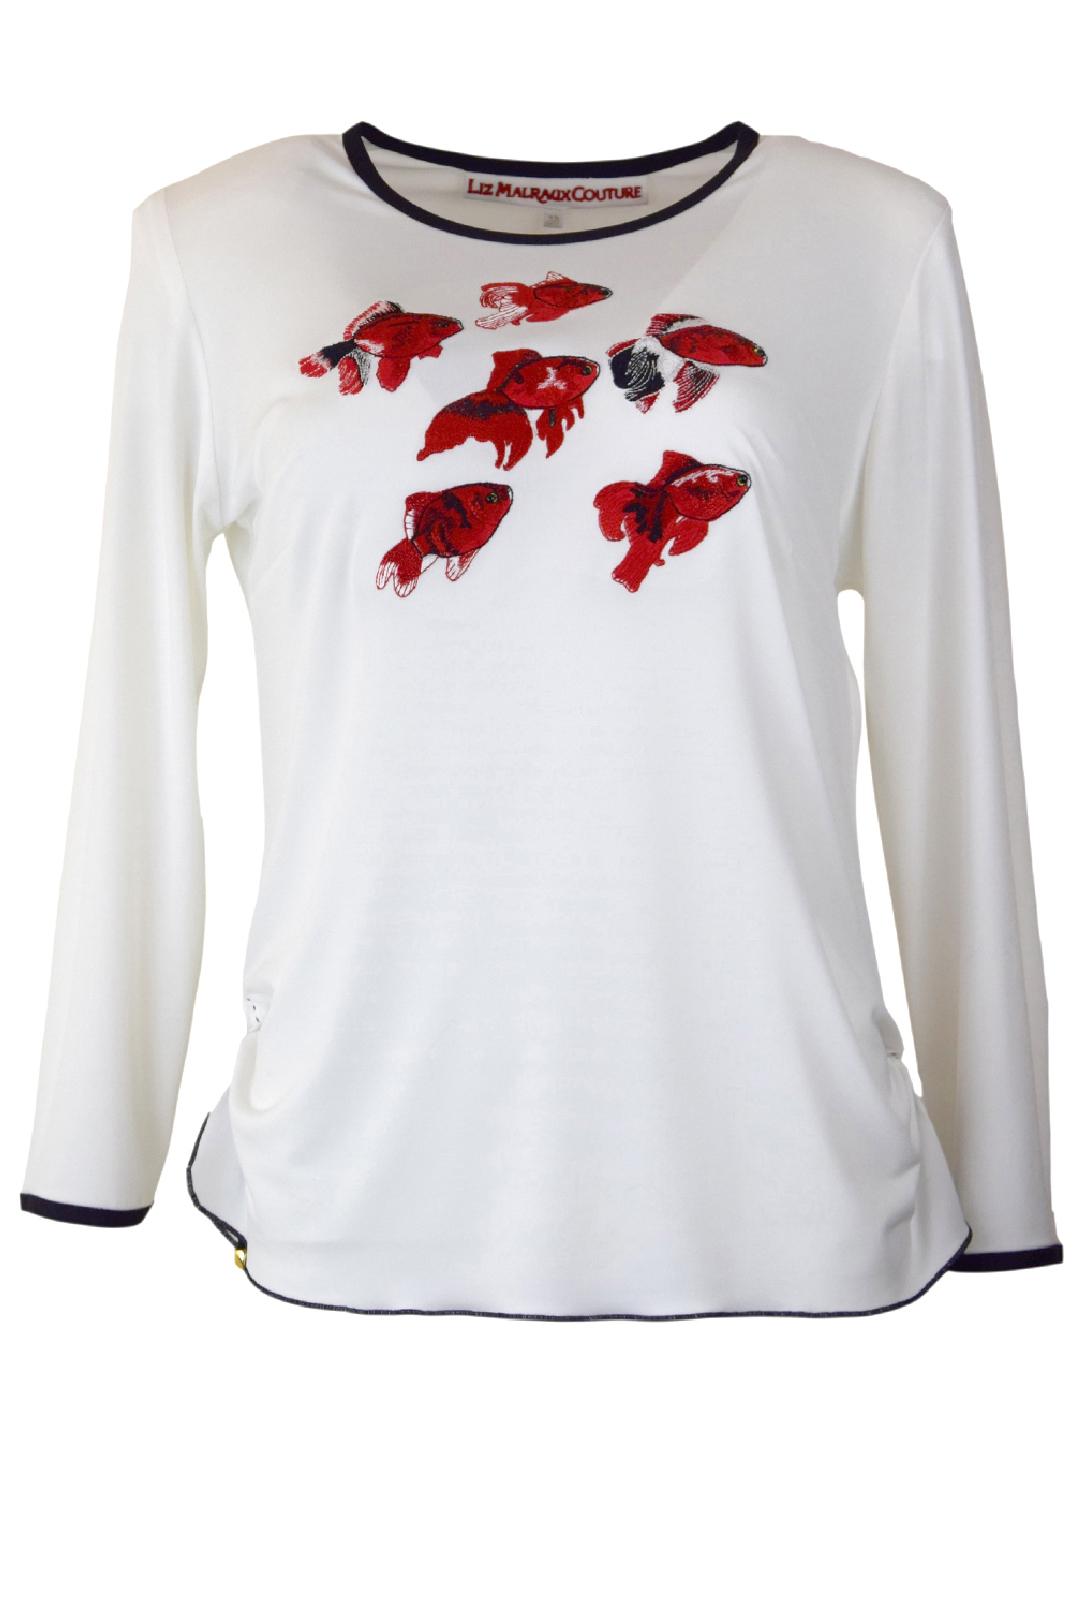 Shirt, Ocean-Embroidery, Kontrast Einfassung, LA